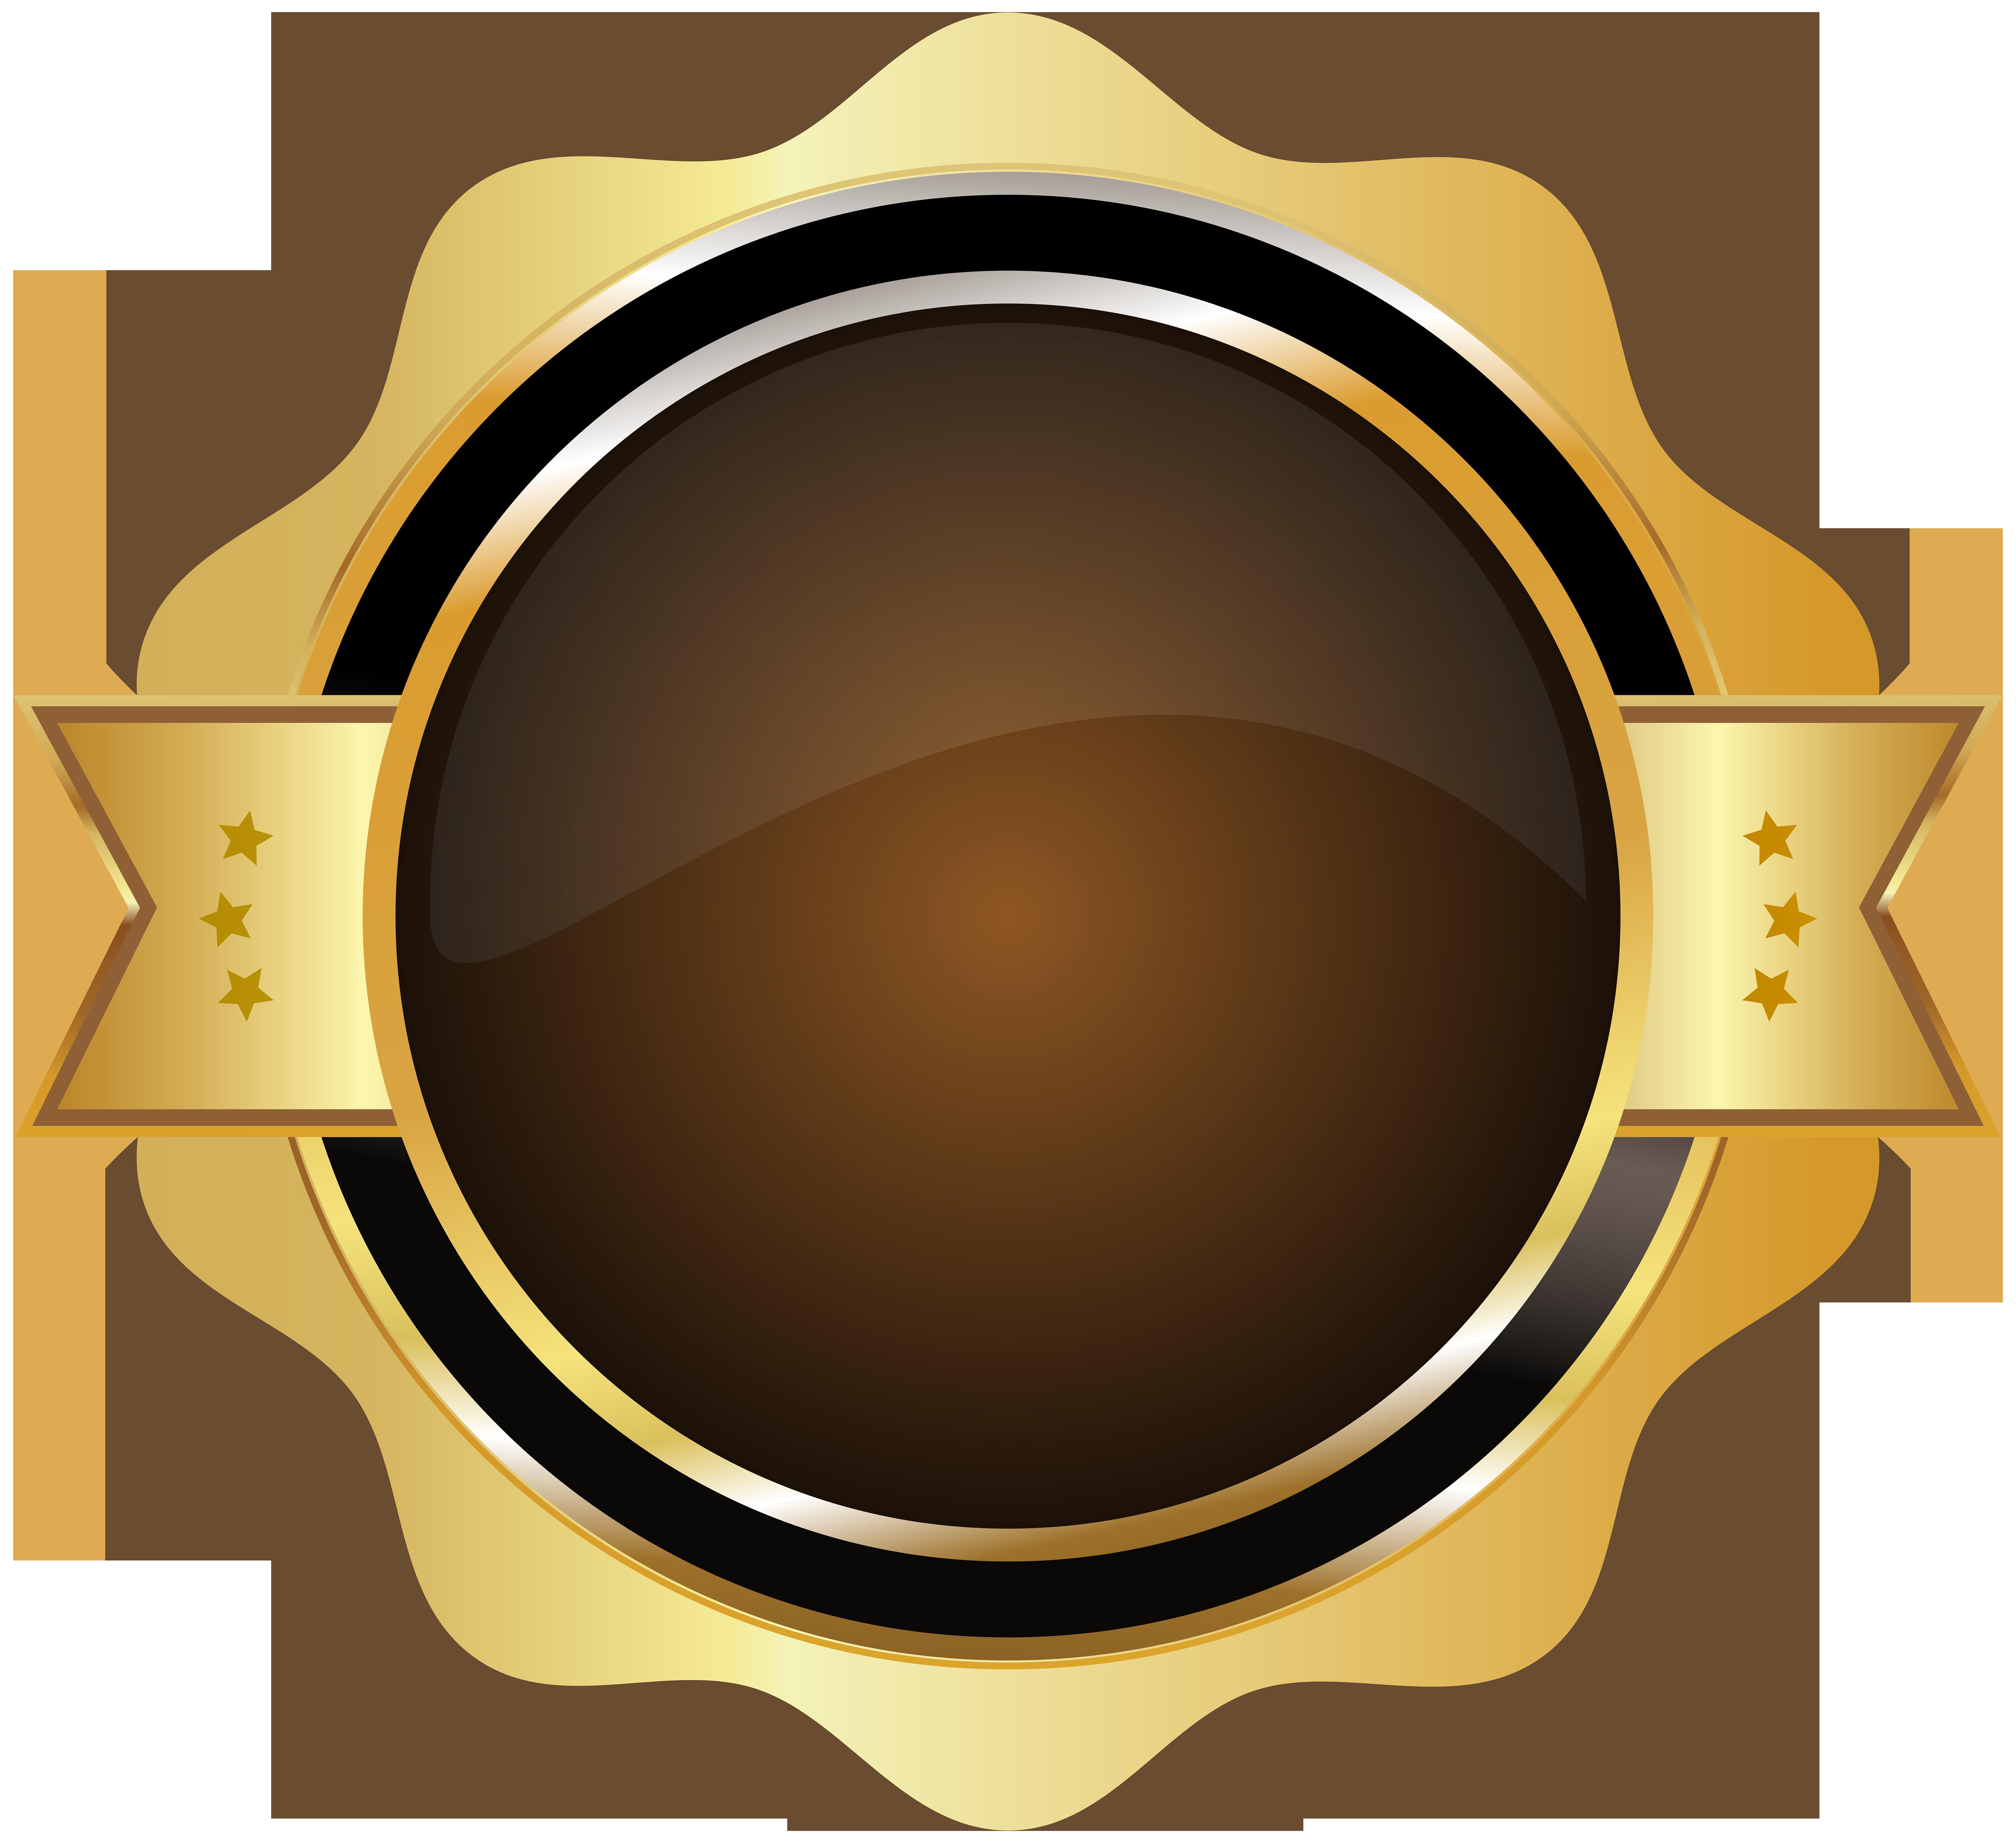 Pin by Manisha K on PNG & Vectors Frame border design